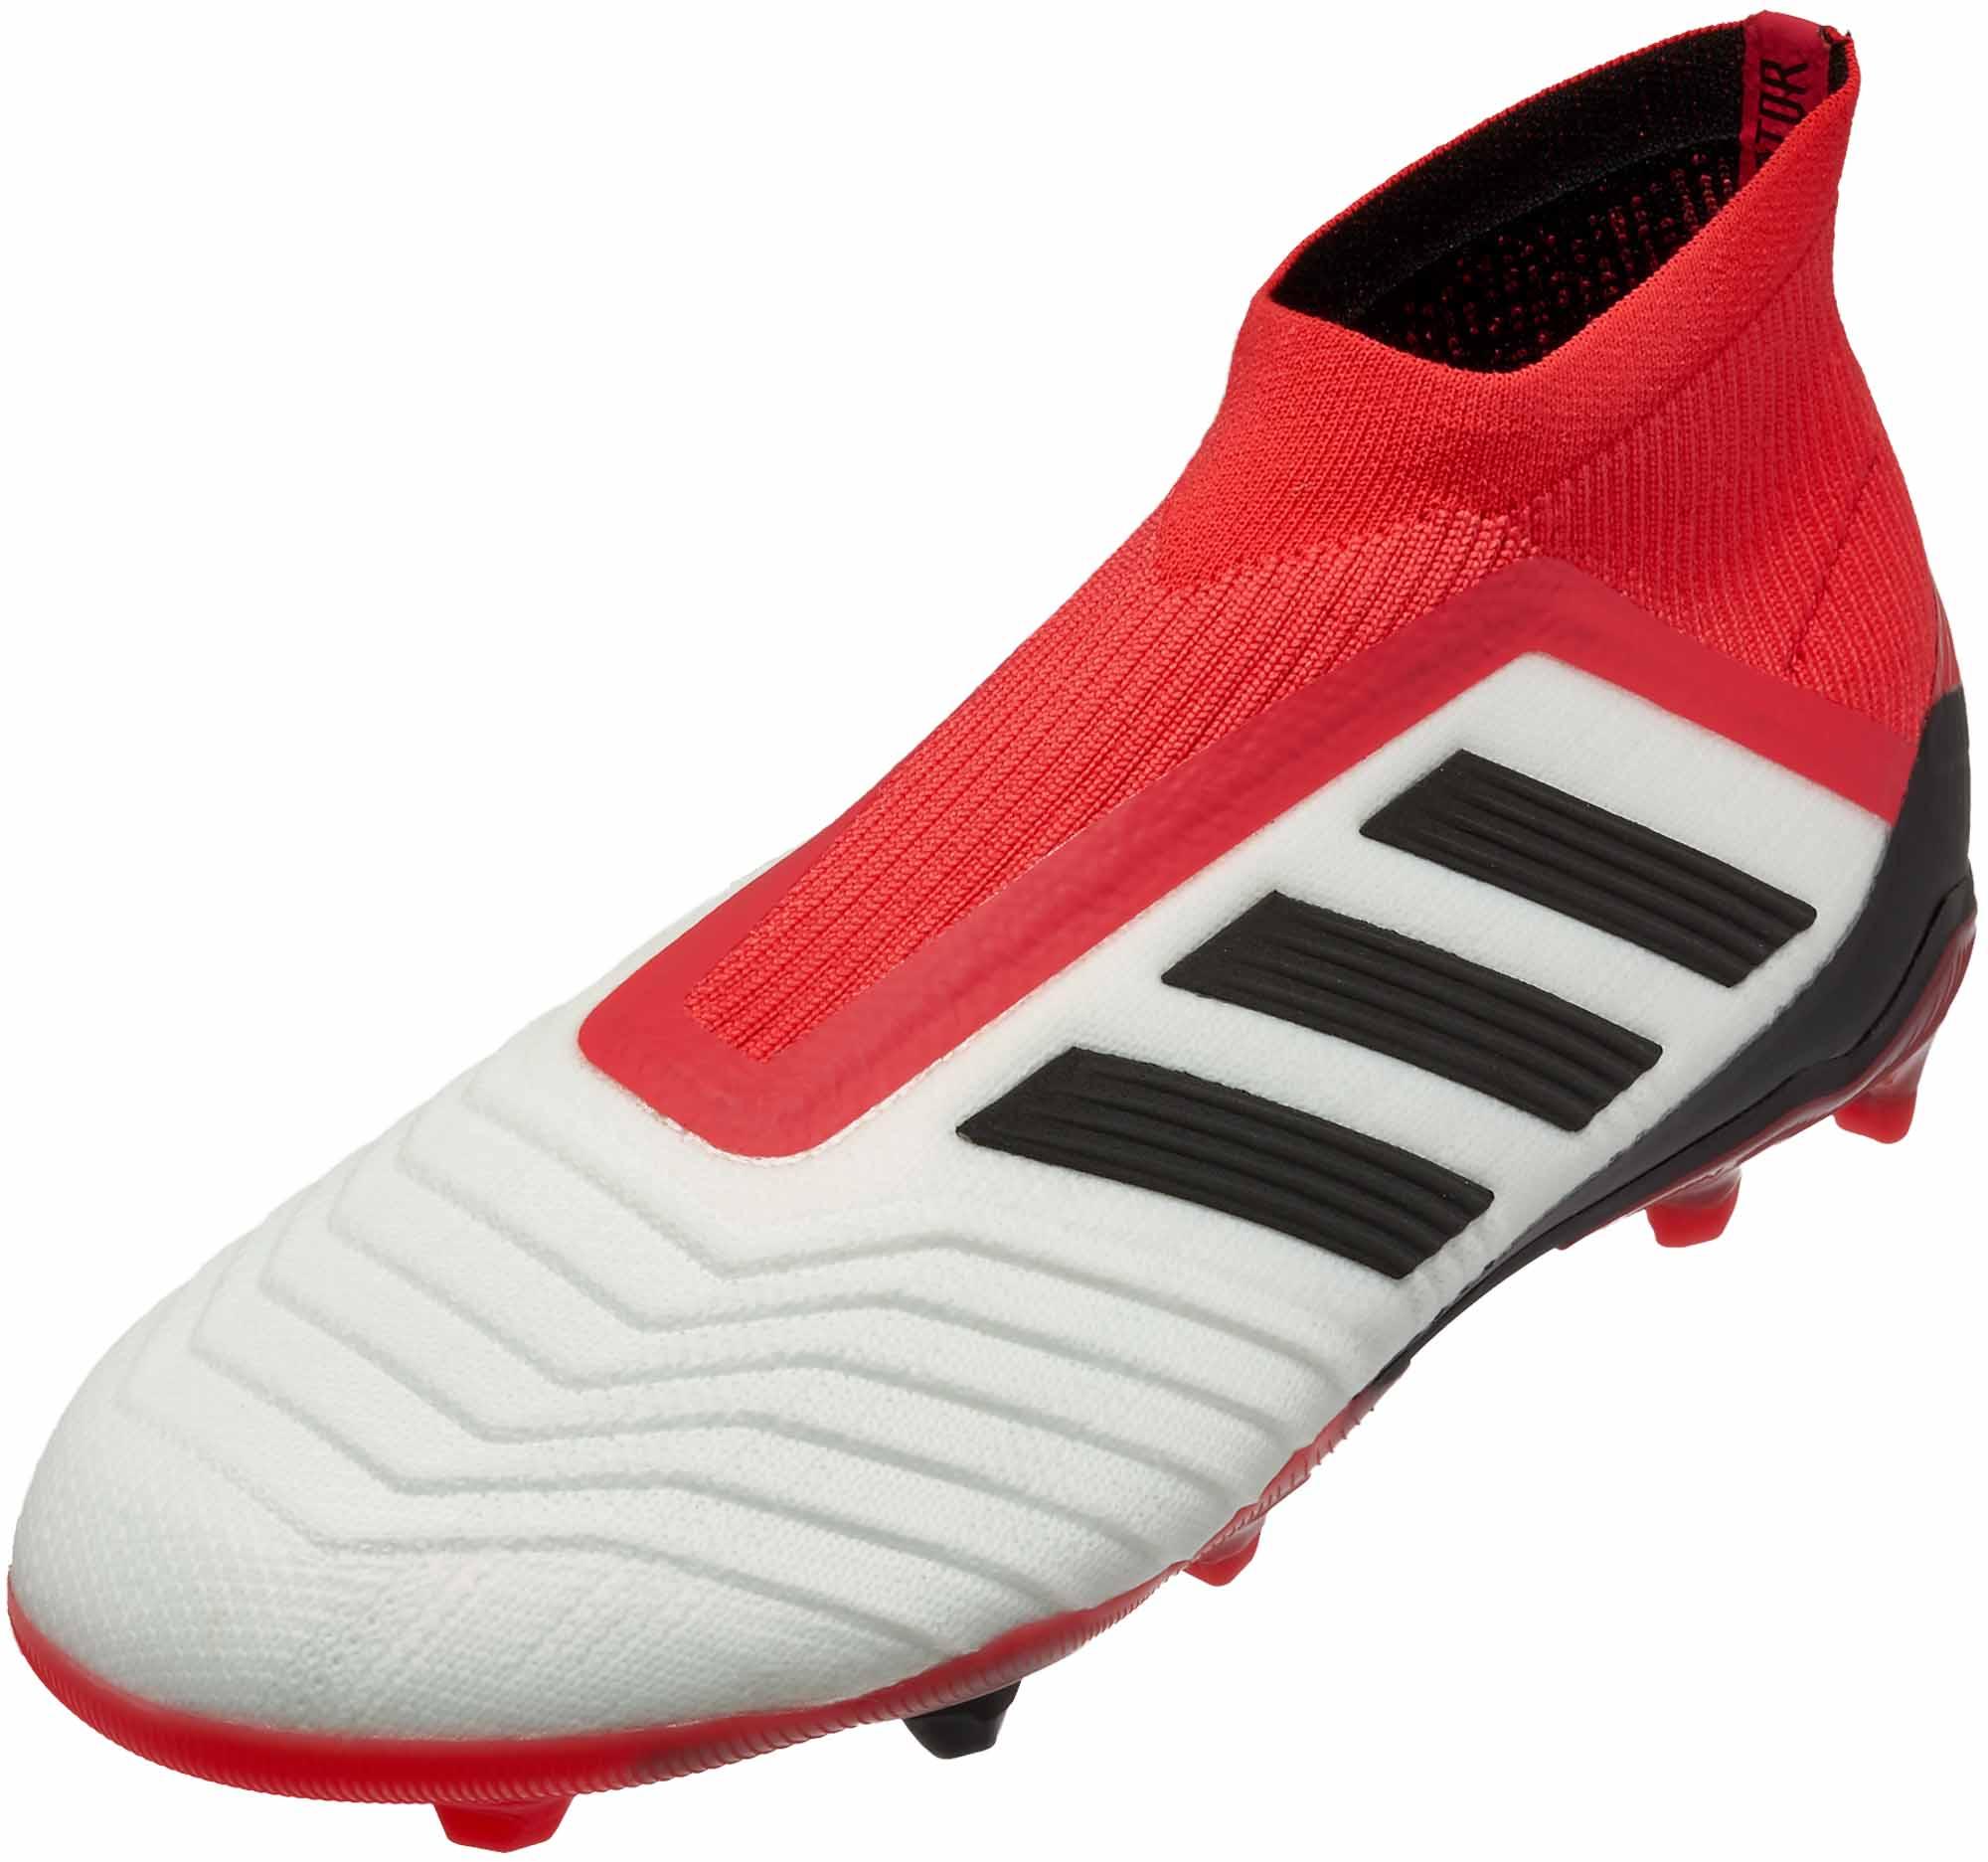 309e56a65a88 adidas Kids Predator 18+ FG - White   Real Coral - Soccer Master